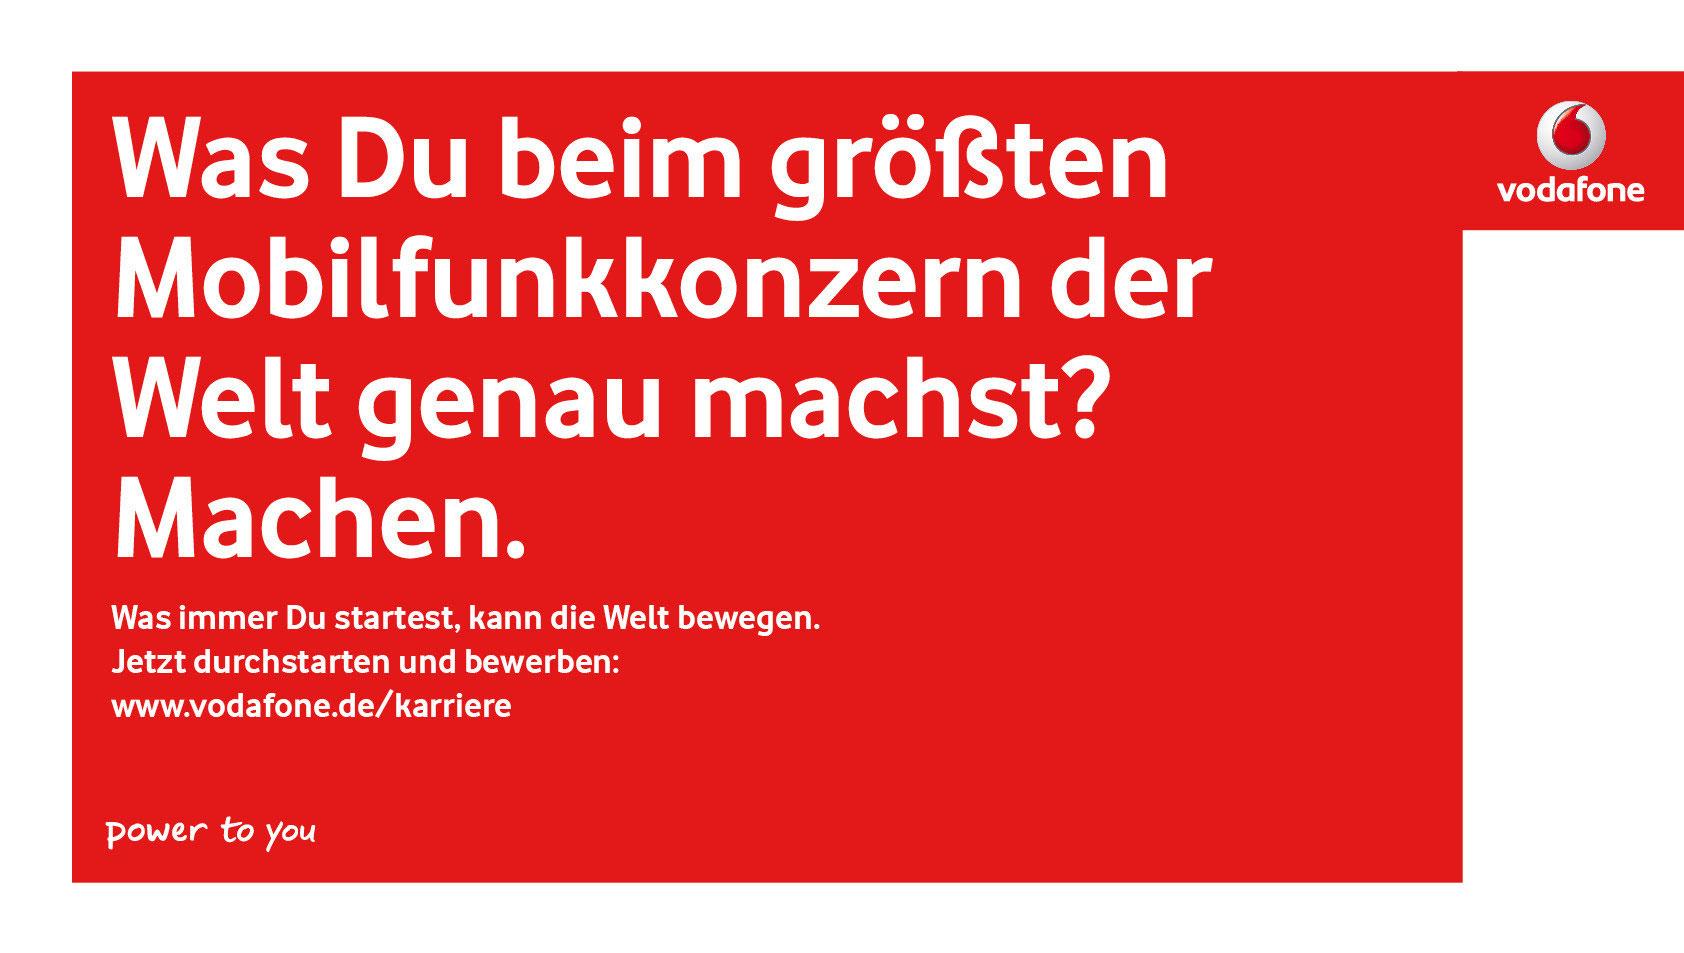 anzeigen plakate felix heine freier werbetexter freelance copywriter - Vodafone Bewerbung